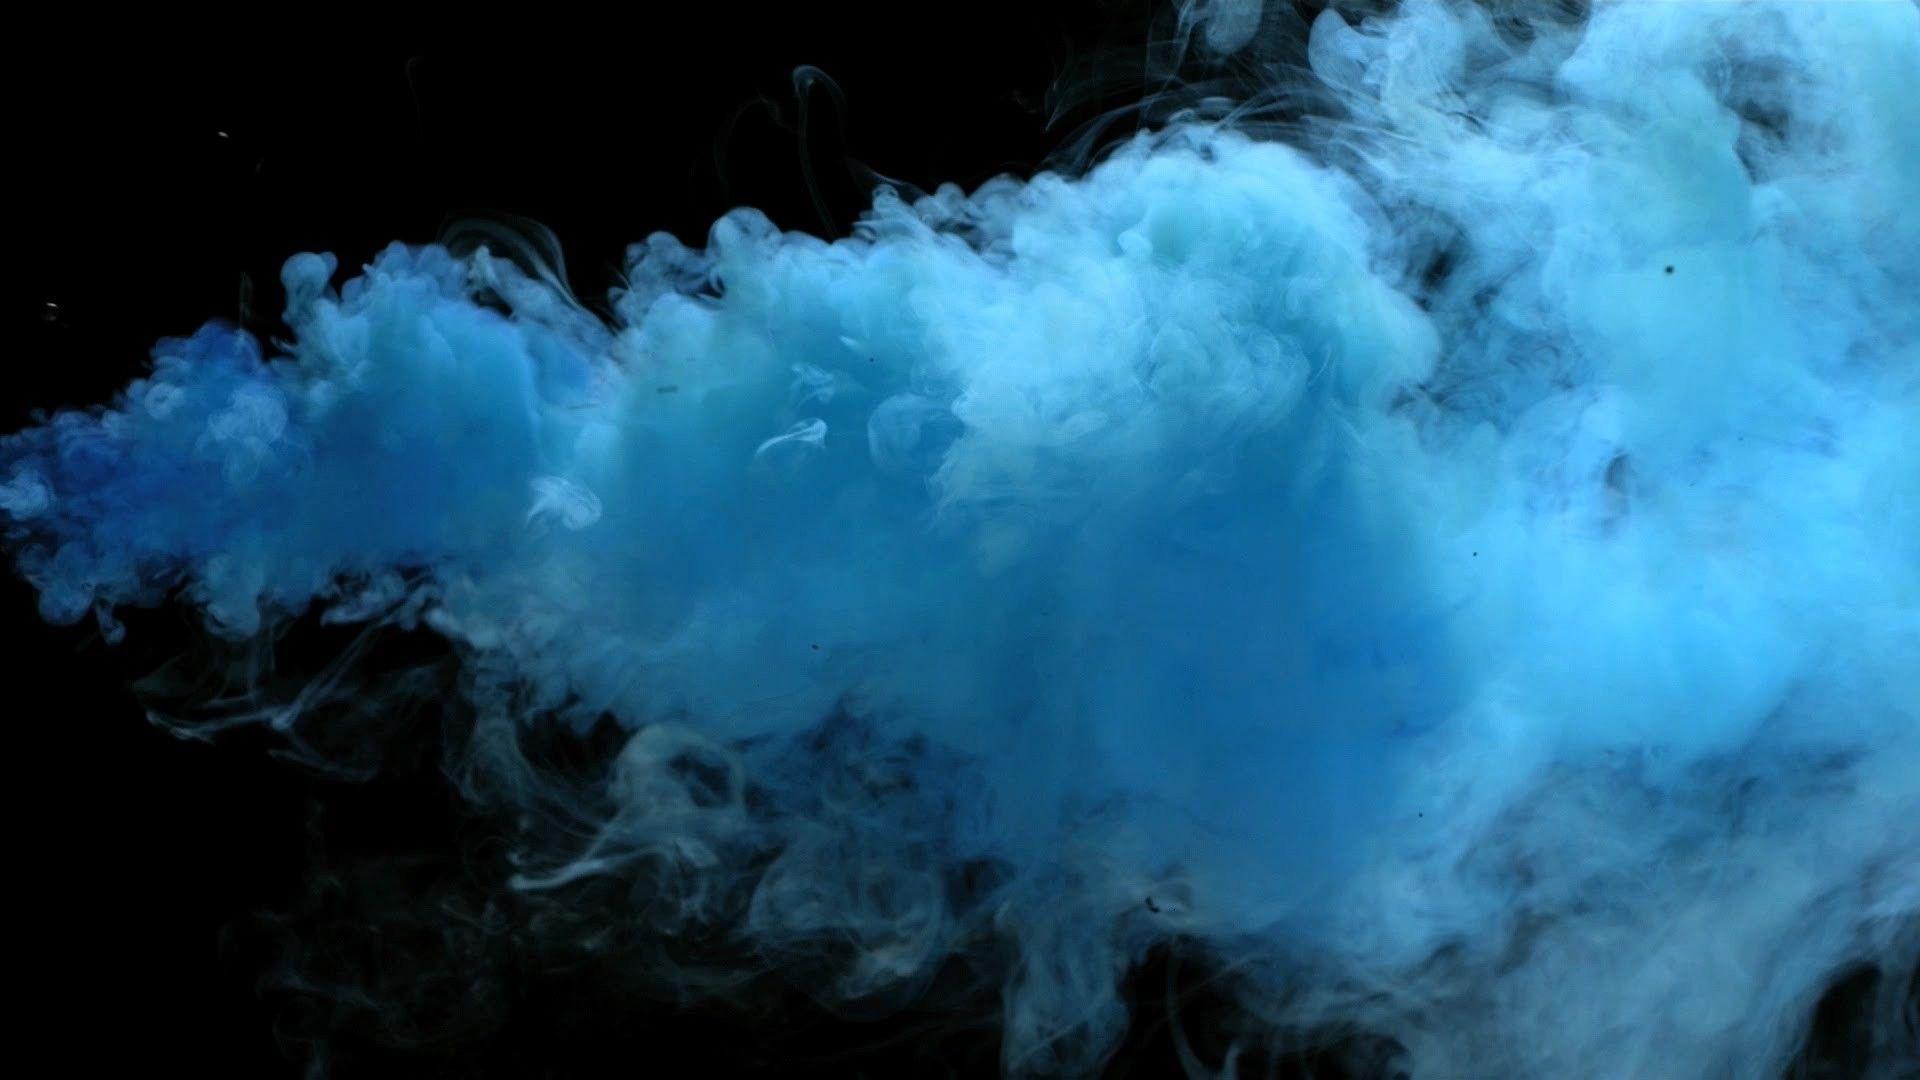 Whence Came The Smoke